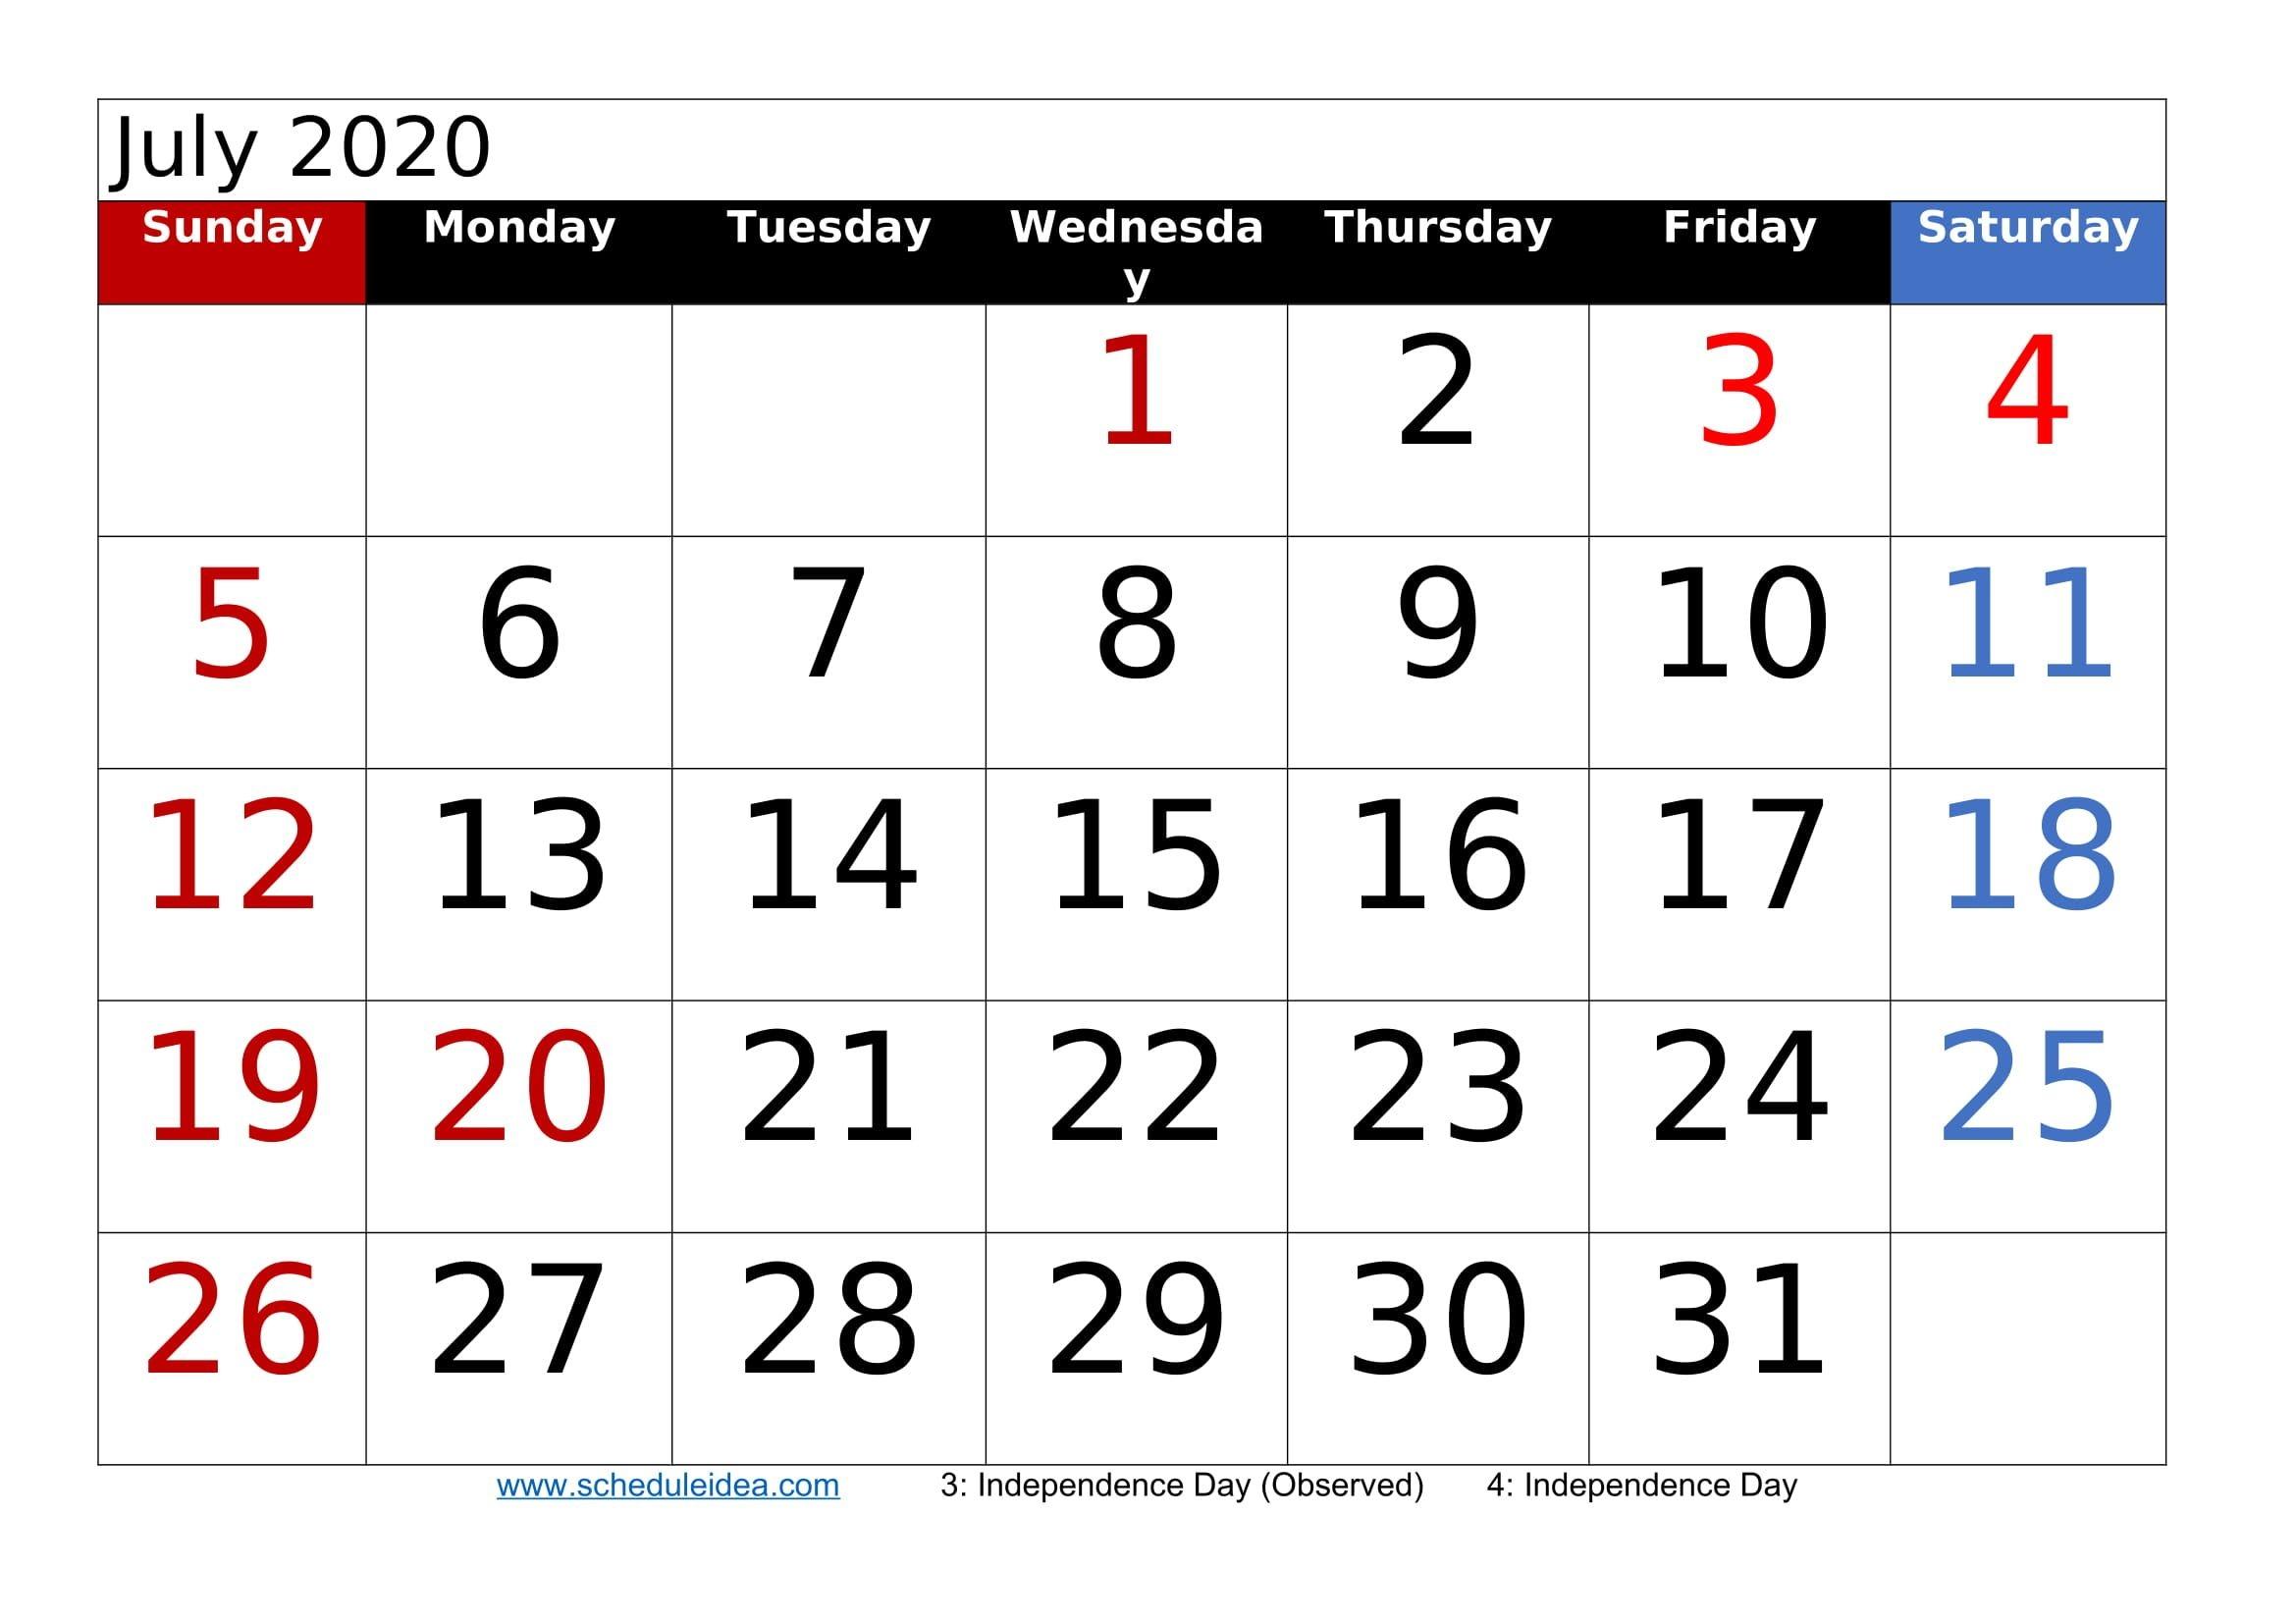 july 2020 printable calendar templates (pdf, word, excel)